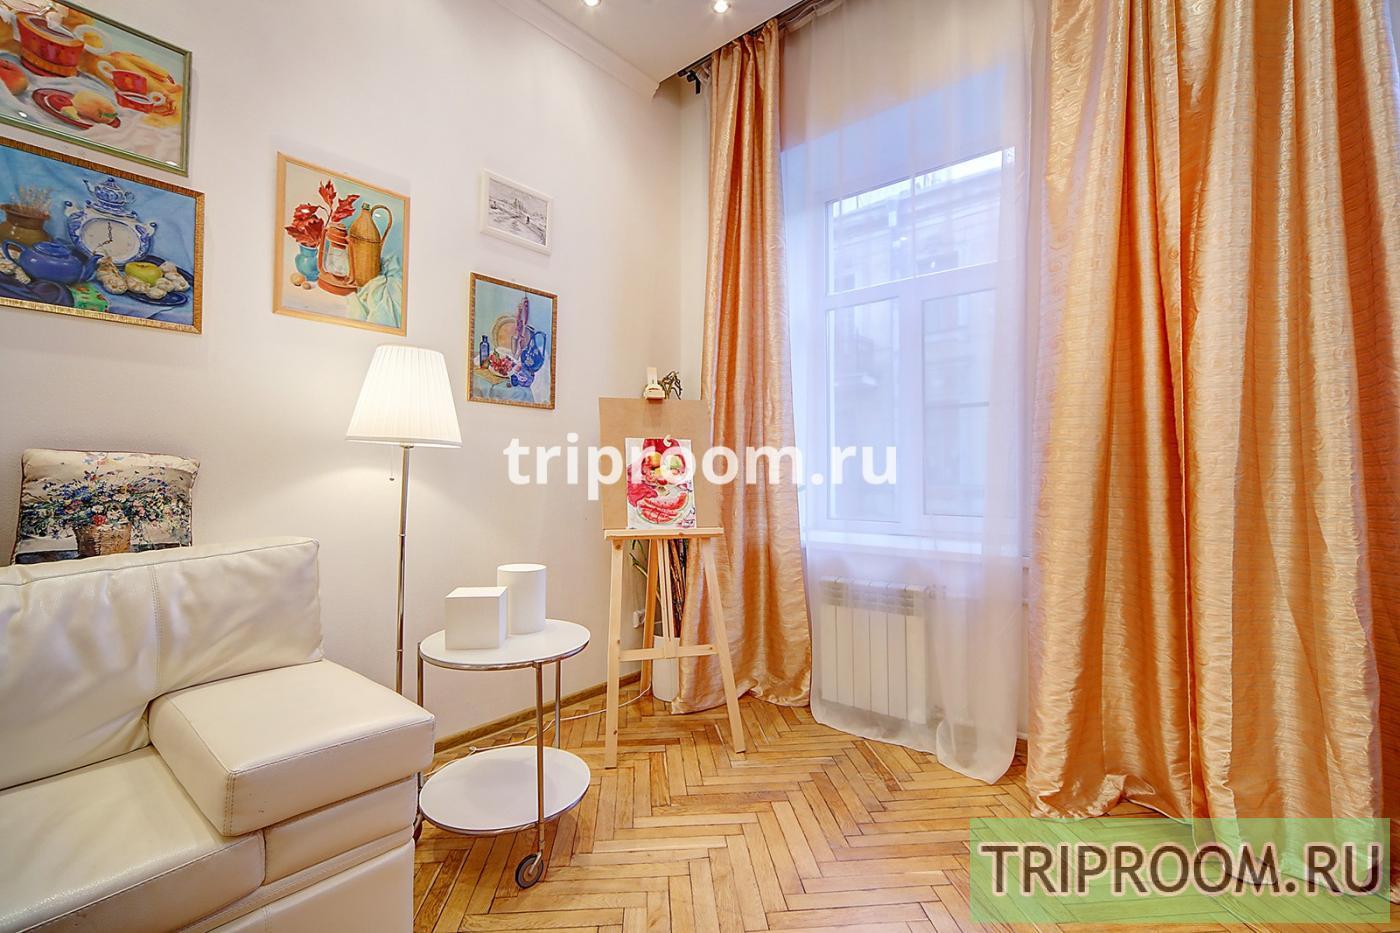 2-комнатная квартира посуточно (вариант № 15426), ул. Лиговский проспект, фото № 4